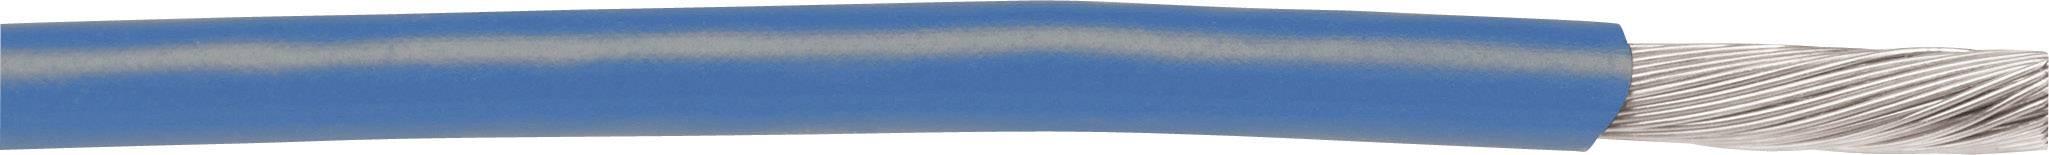 Pletenica EcoWire 1 x 0.32 mm, modra AlphaWire 6713 30.5 m